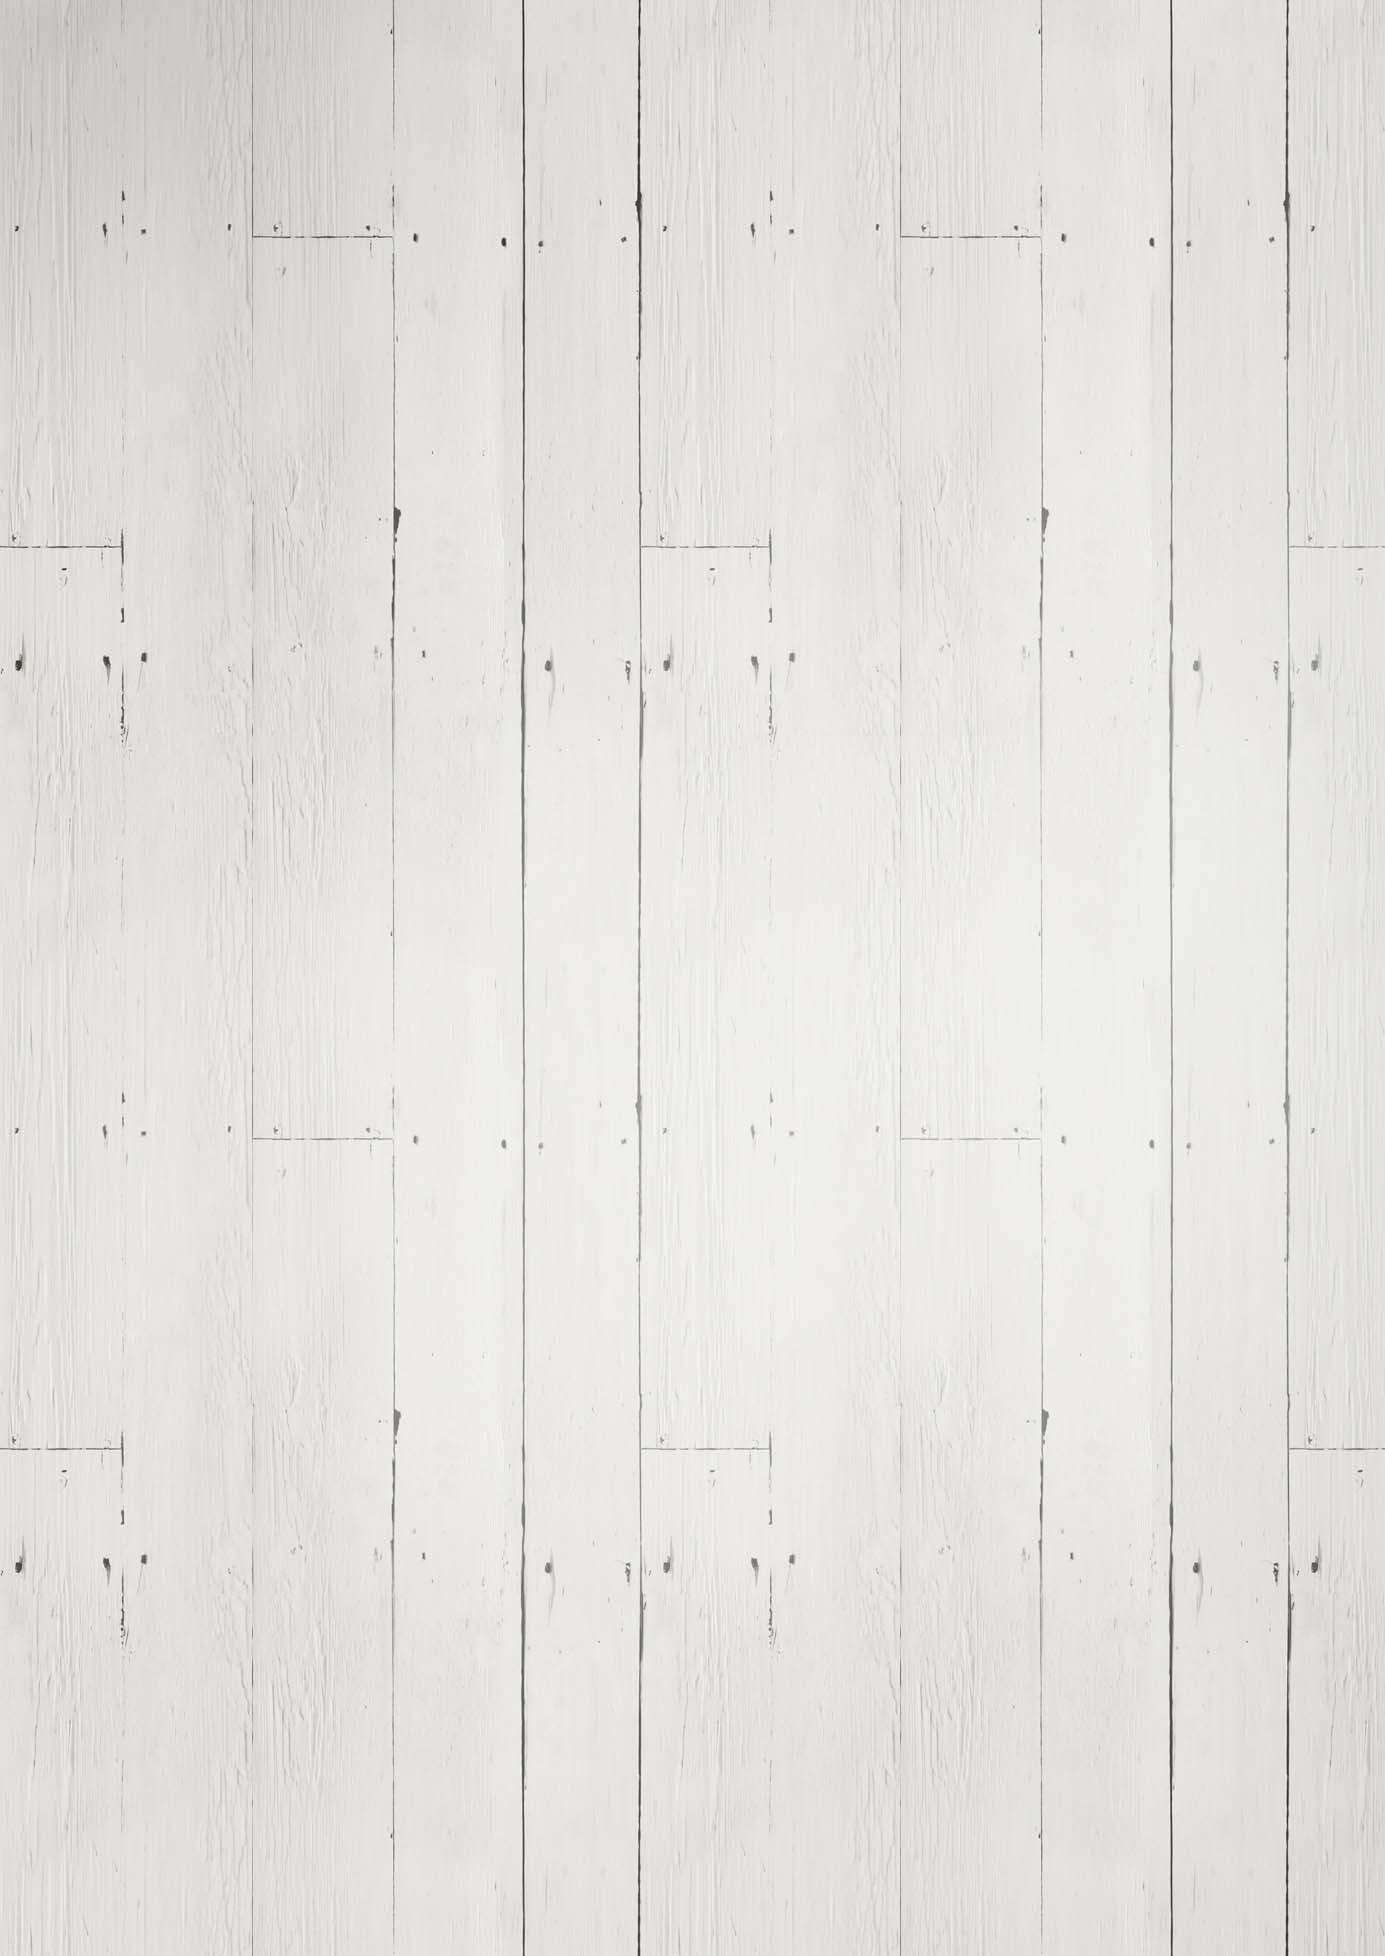 Battaglia White Plank Wallpaper Wallpaper – YB white plank wallpaper